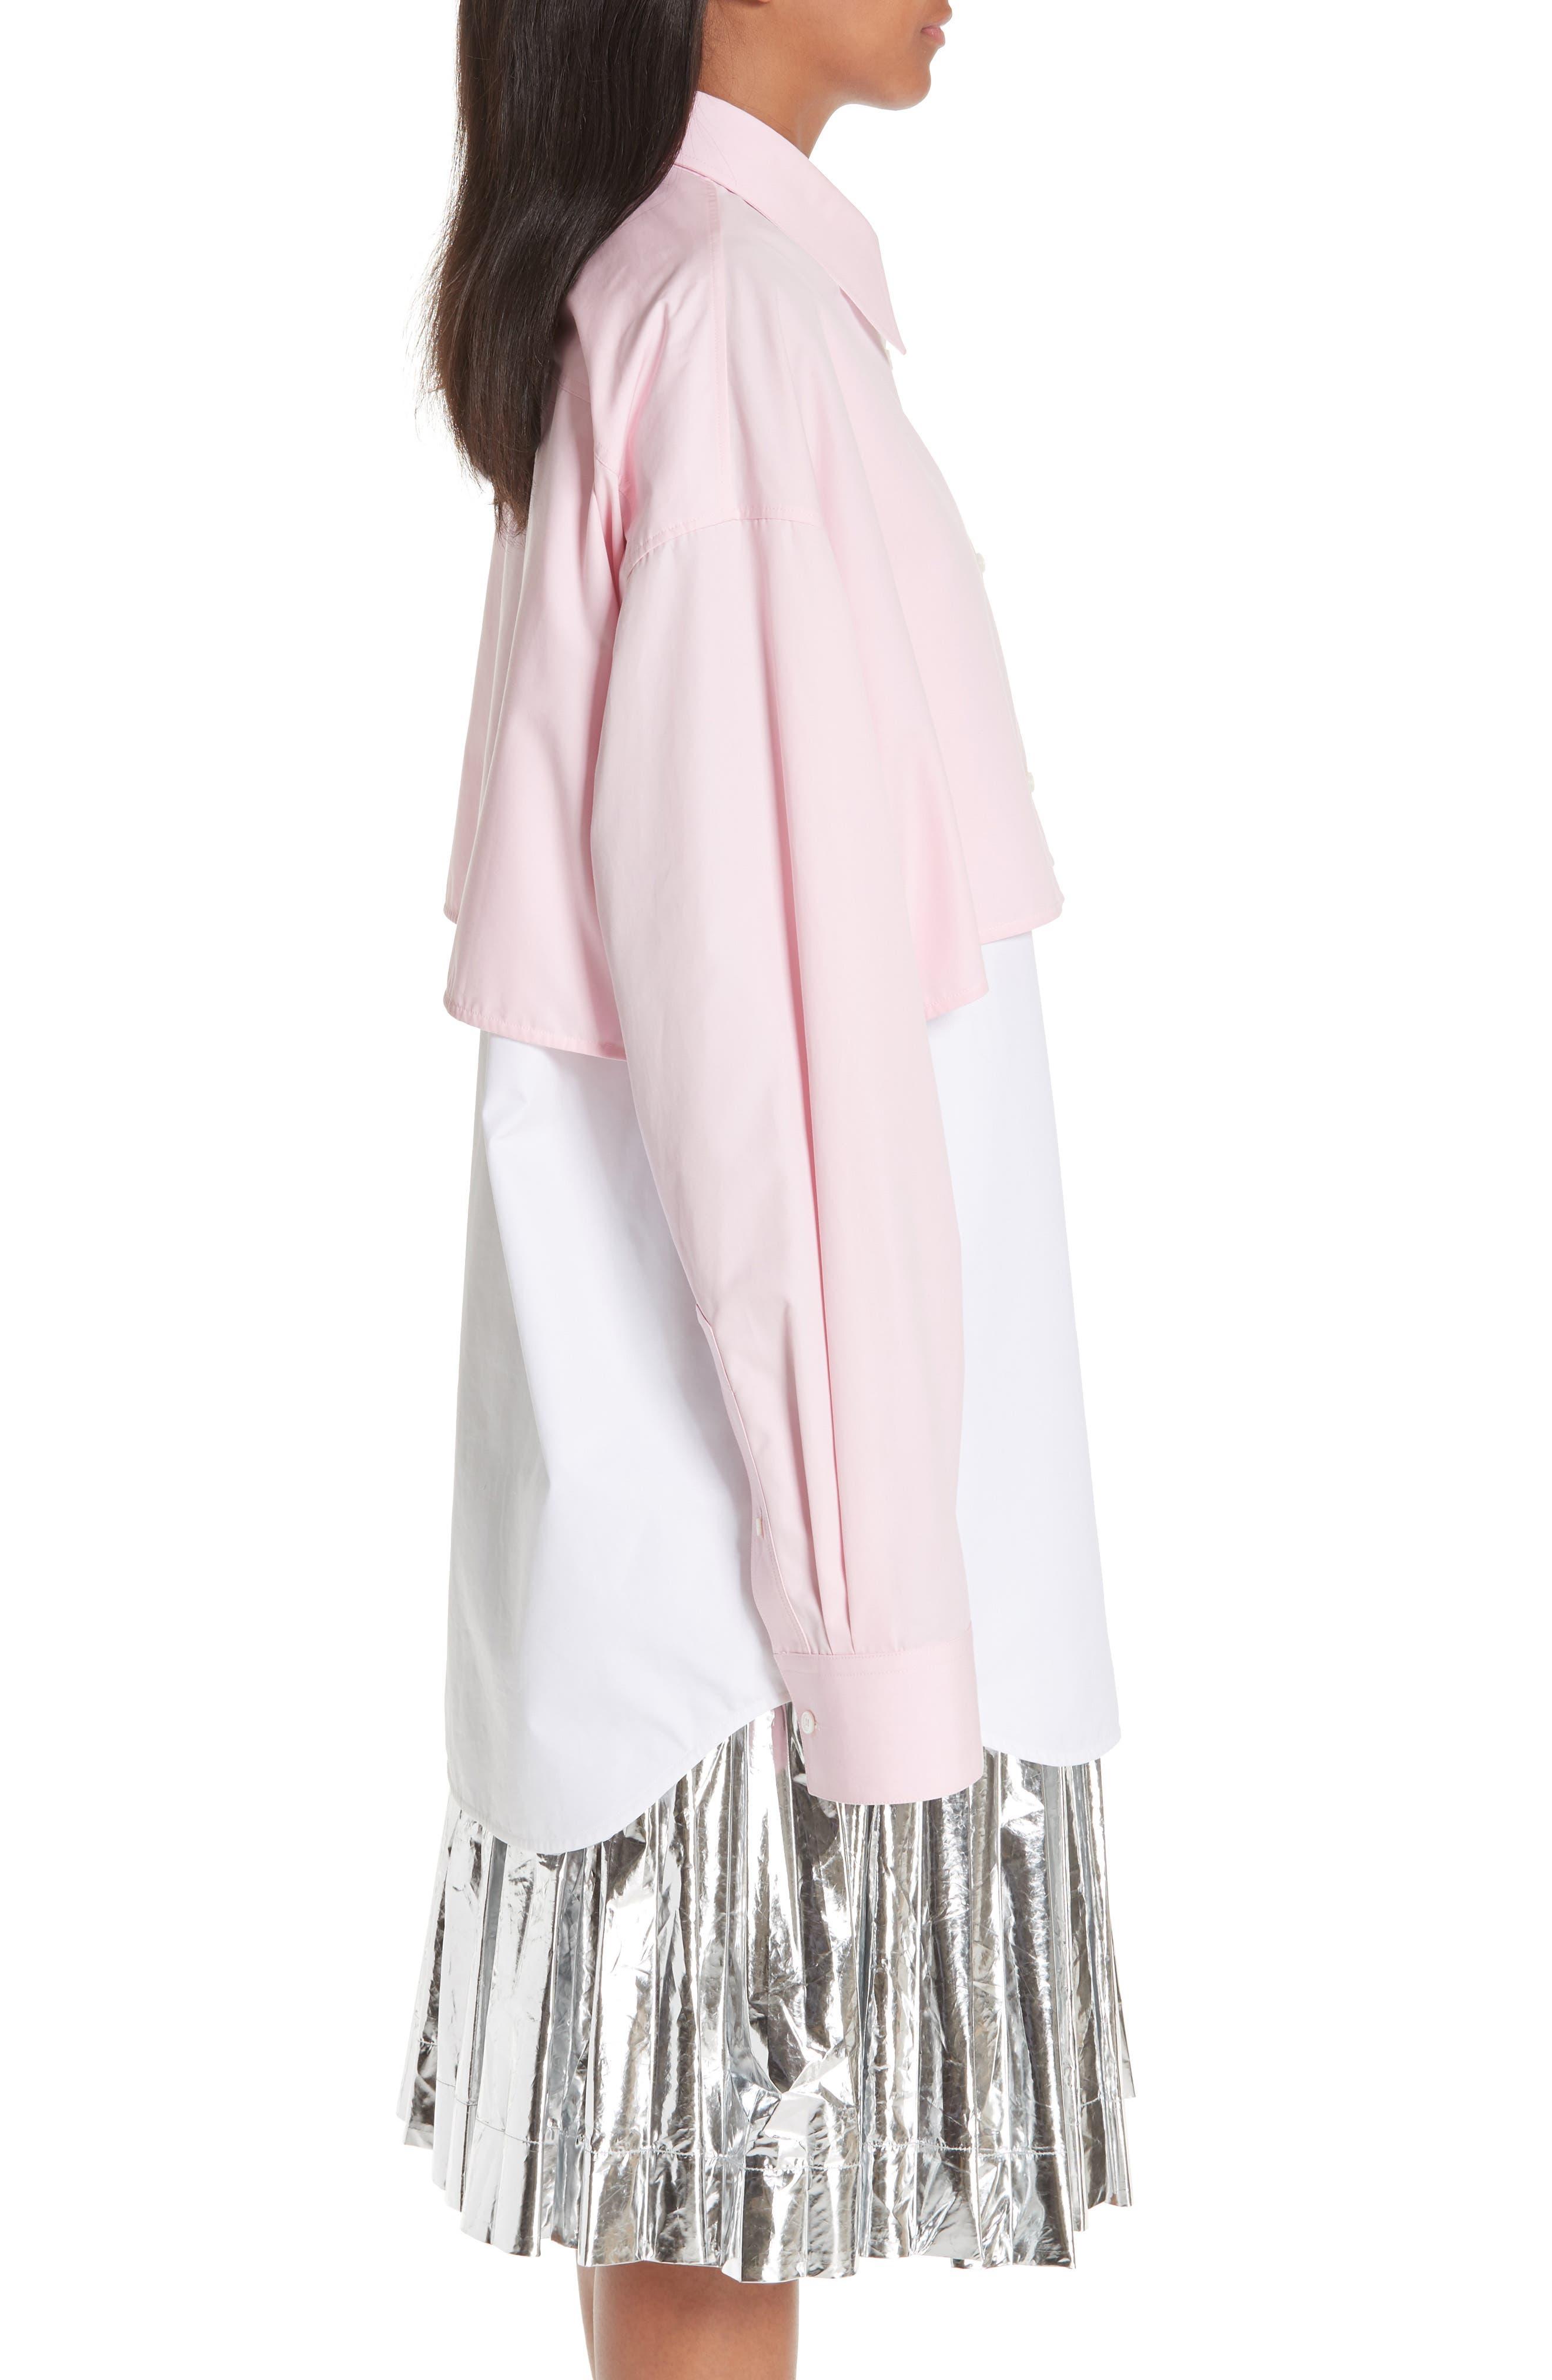 CALVIN KLEIN 205W39NYC, Layered Cotton Poplin Shirt, Alternate thumbnail 5, color, ROSE OPTIC WHITE